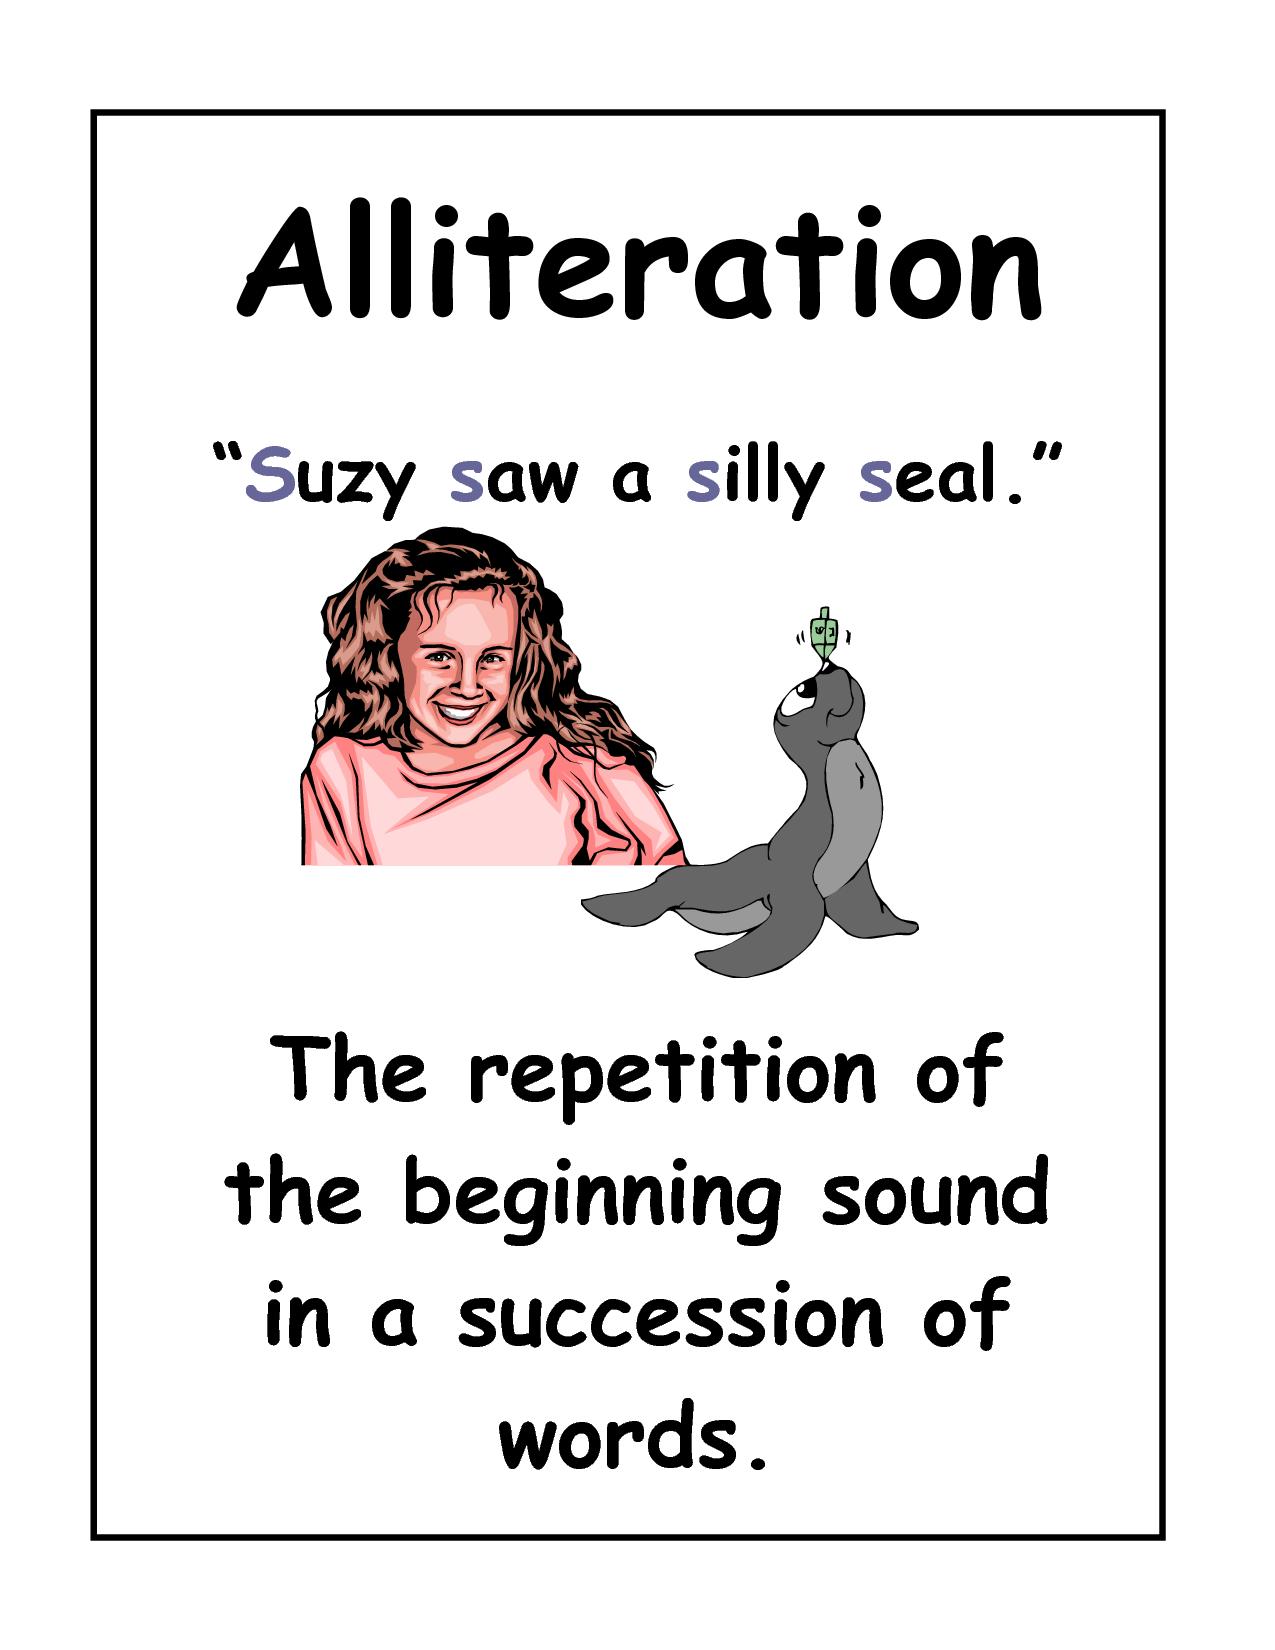 Alliteration example poster | FIGURATIVE LANGUAGE ...